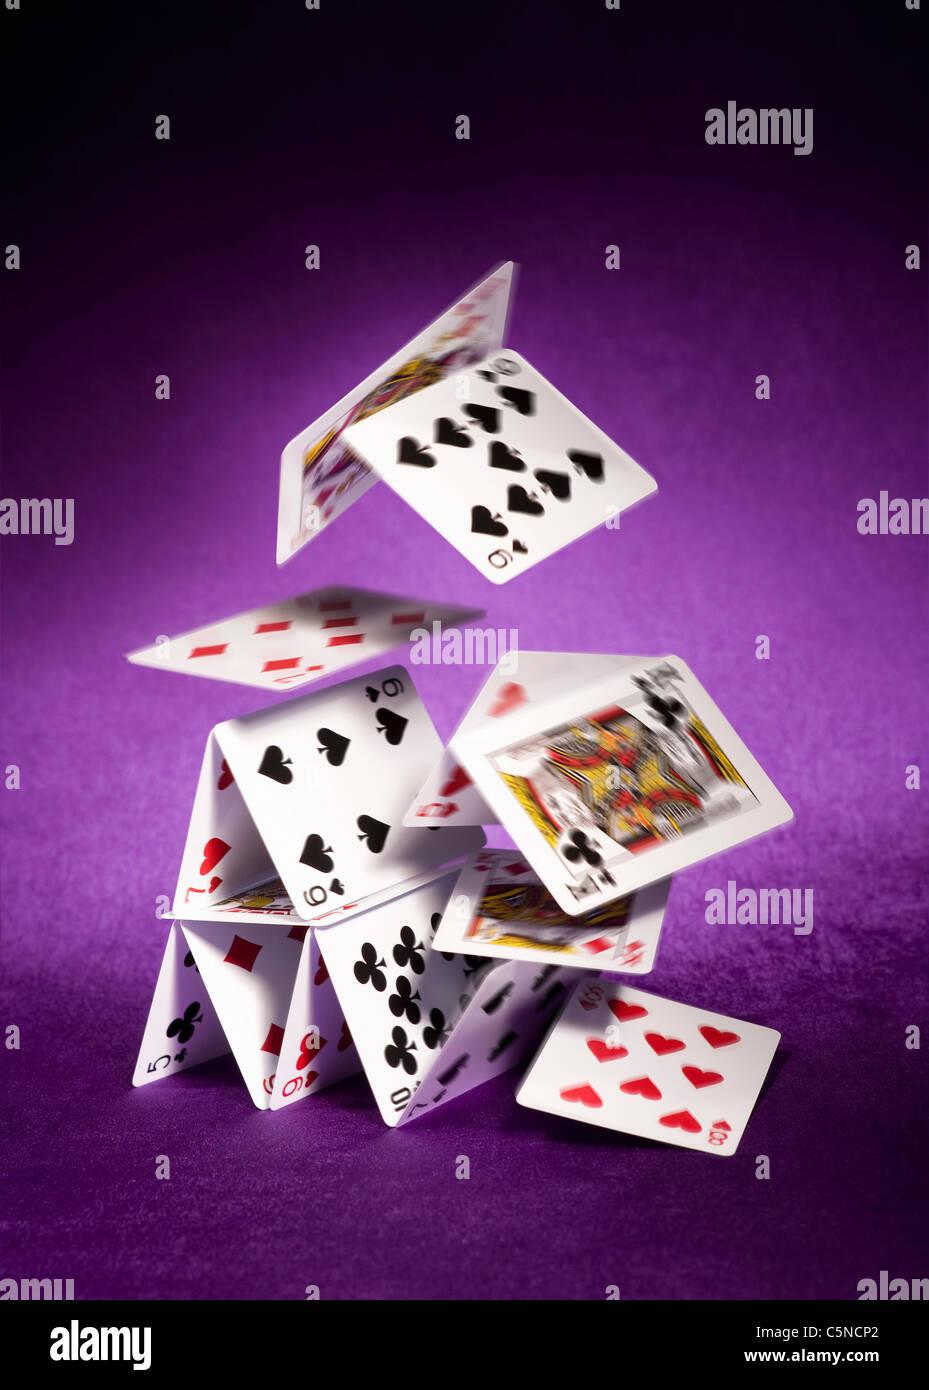 Un château de cartes tomber vers le bas Photo Stock